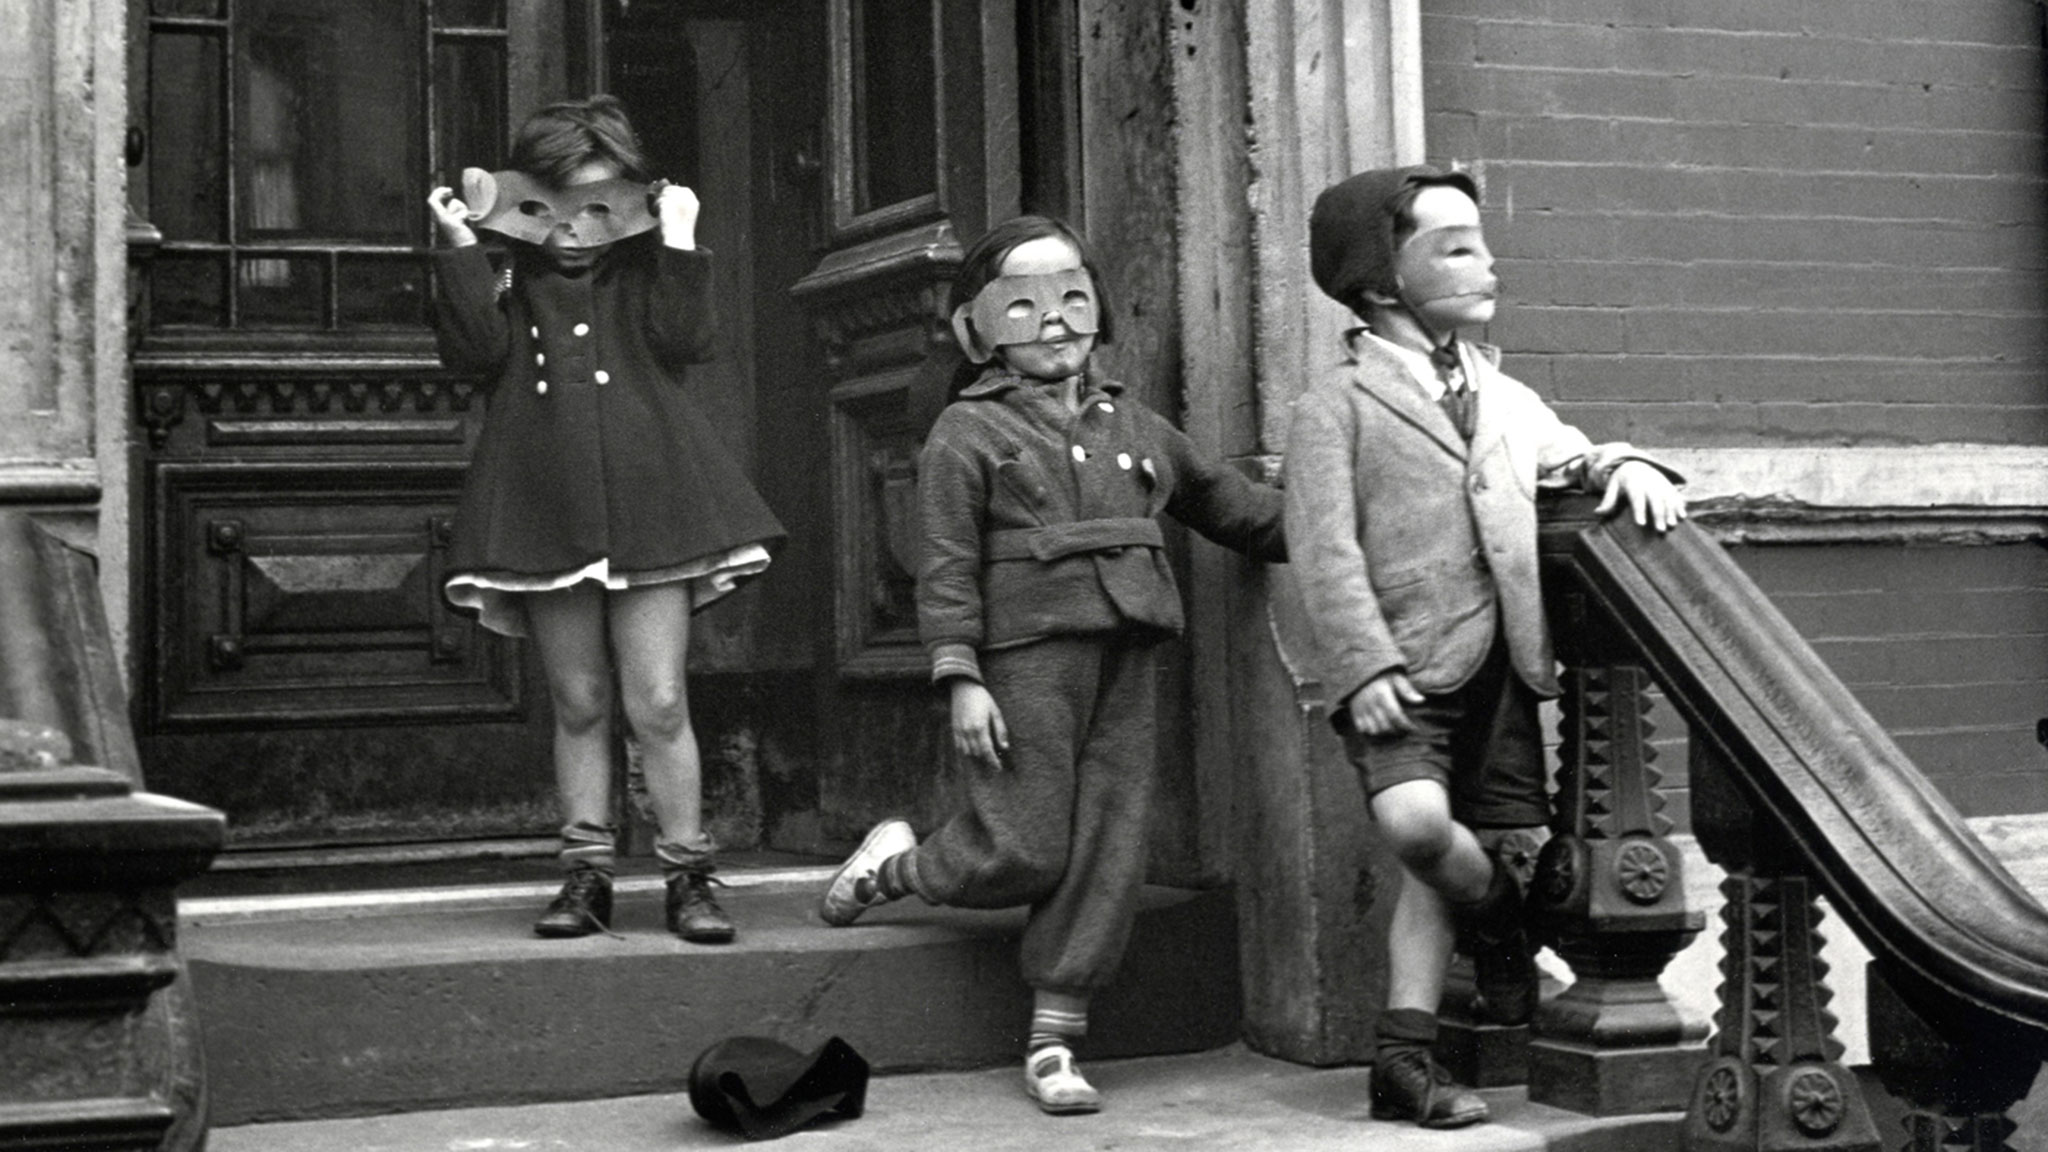 Helen Levitt New York.Three Masked Children on Stoop (1942). ©Galerie Thomas Zander, Cologne